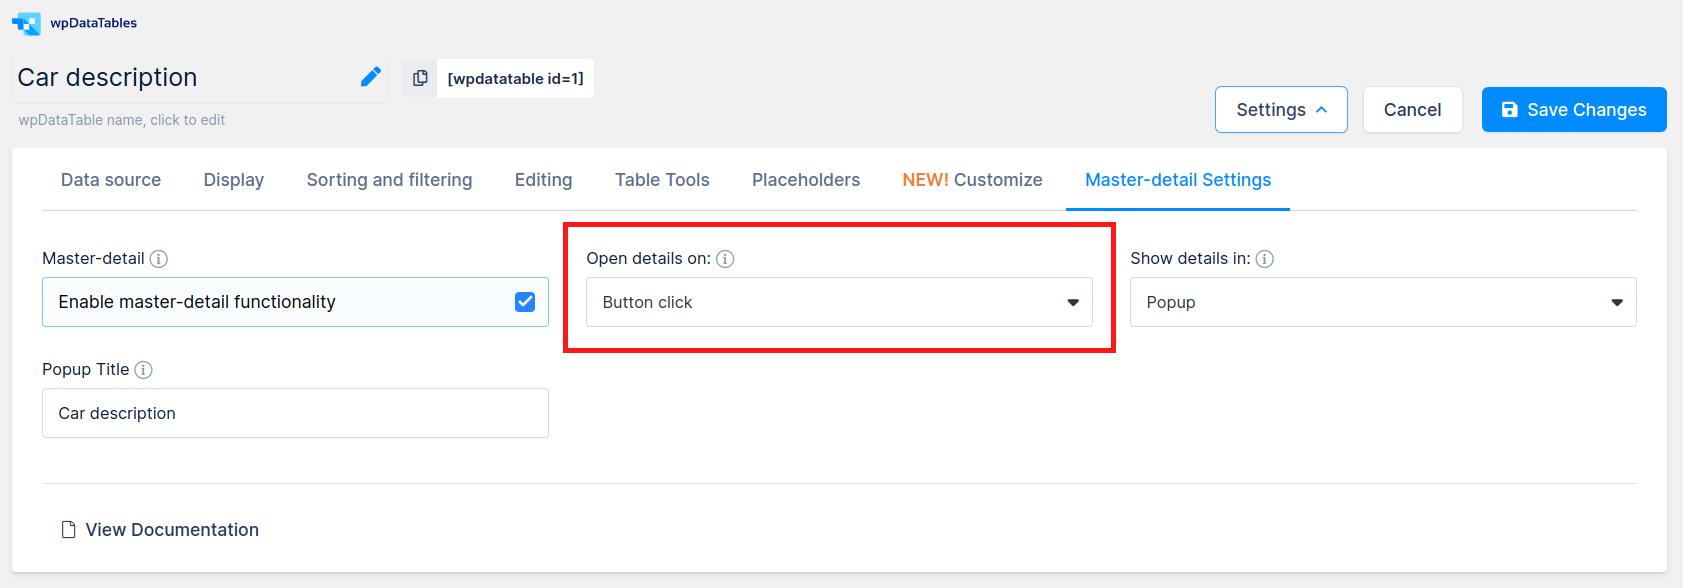 Master detail button click option